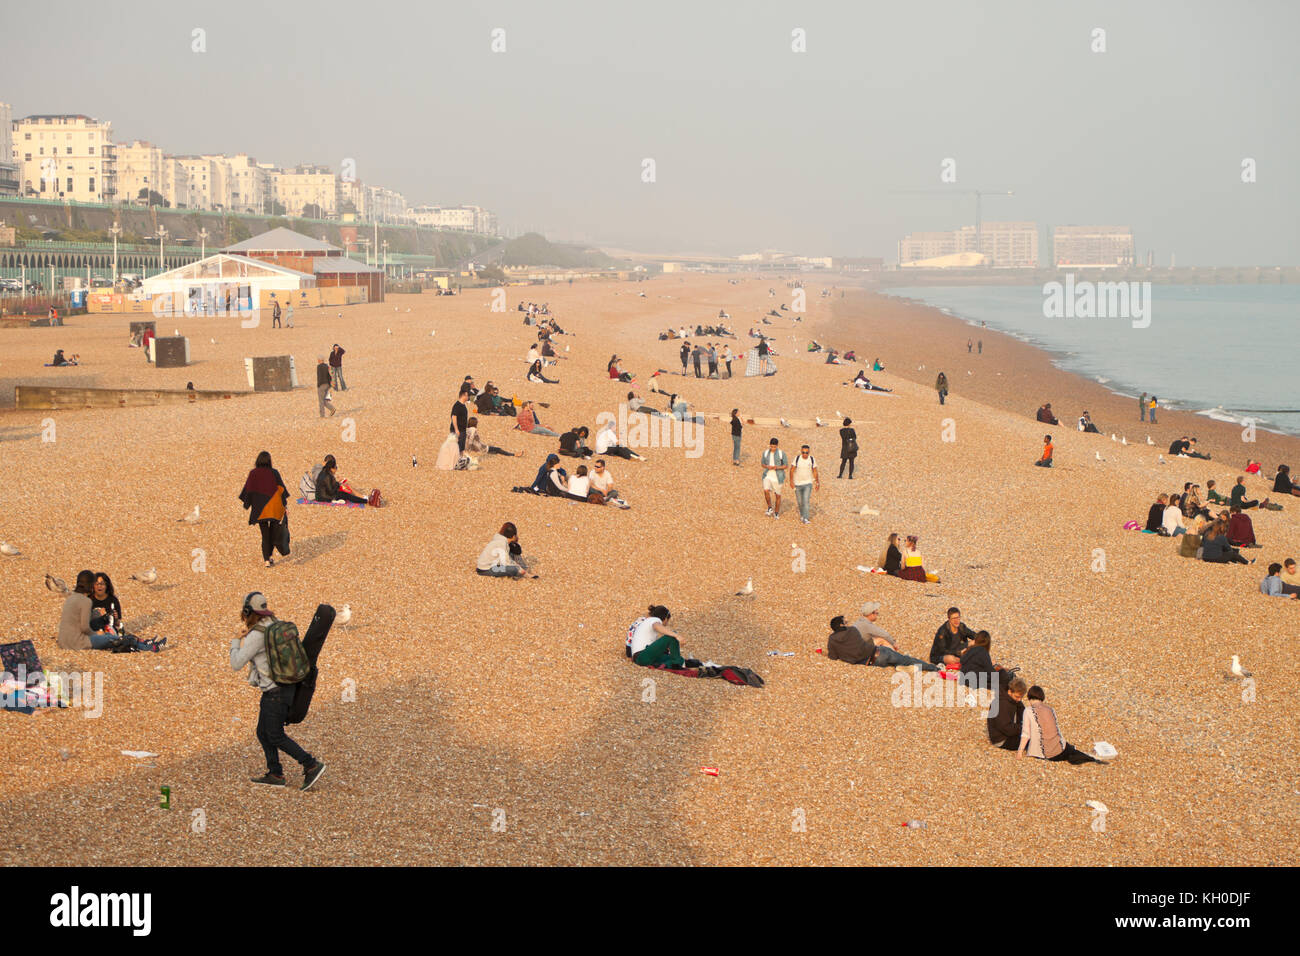 A Hazy day on Brighton Beach, UK - Stock Image